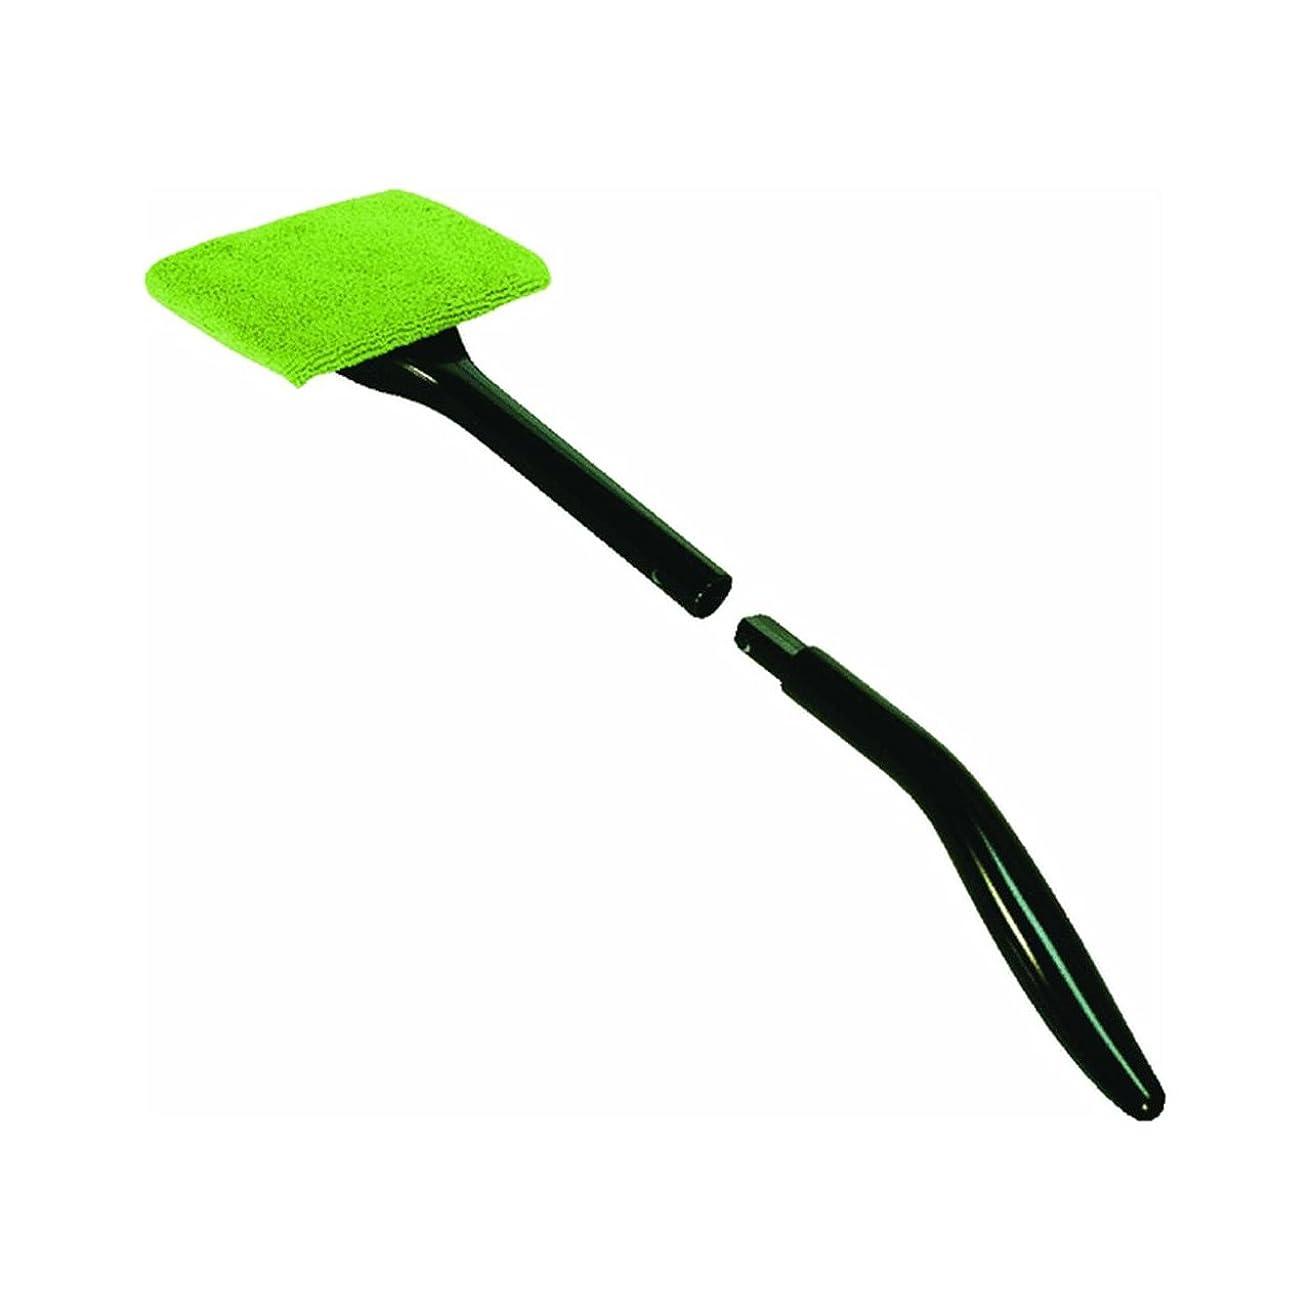 Telebrands Windshield Wonder Microfiber Long Handled Cleaning Tool